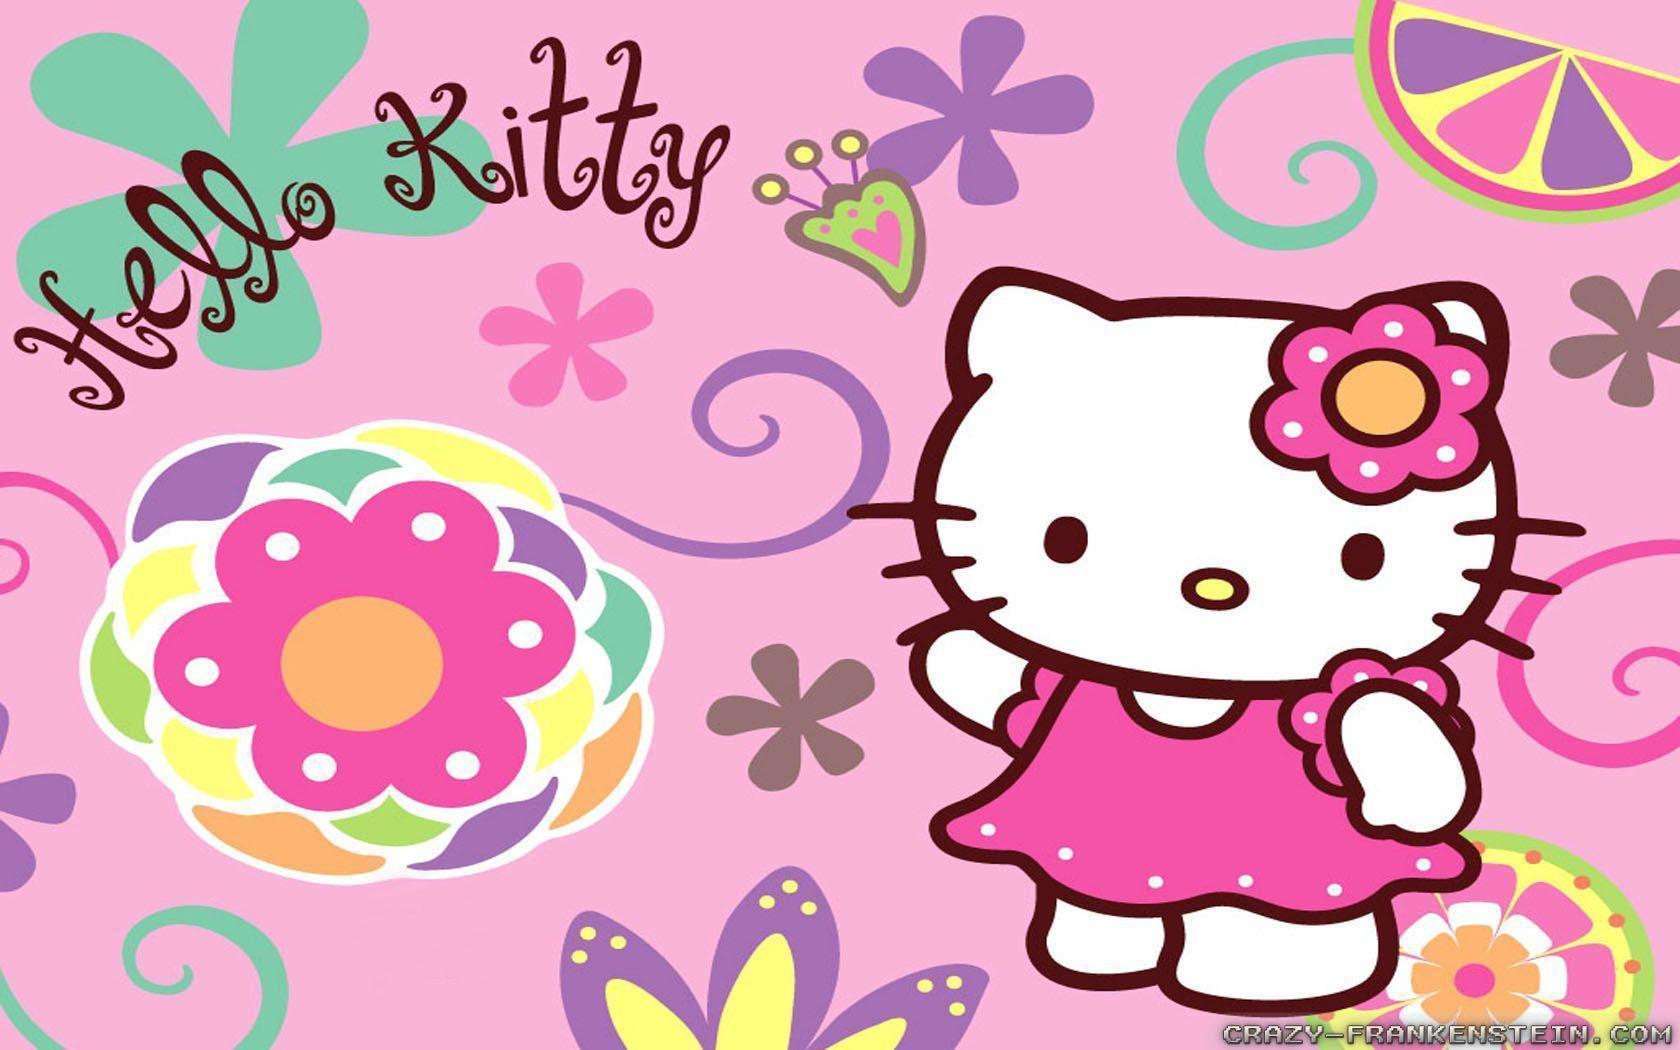 Most Inspiring Wallpaper Hello Kitty Pink - w5nZHnW  Photograph_336550.jpg